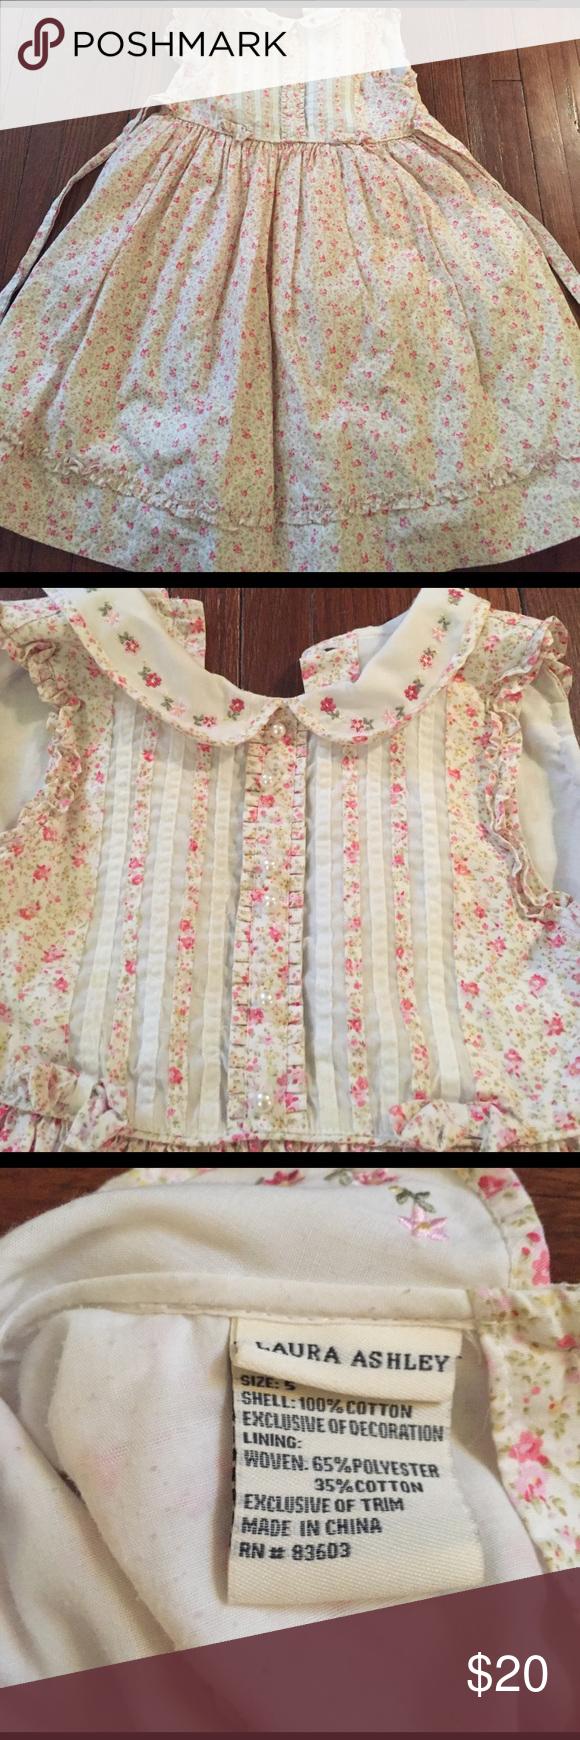 Laura ashley girls dress my posh closet pinterest dresses